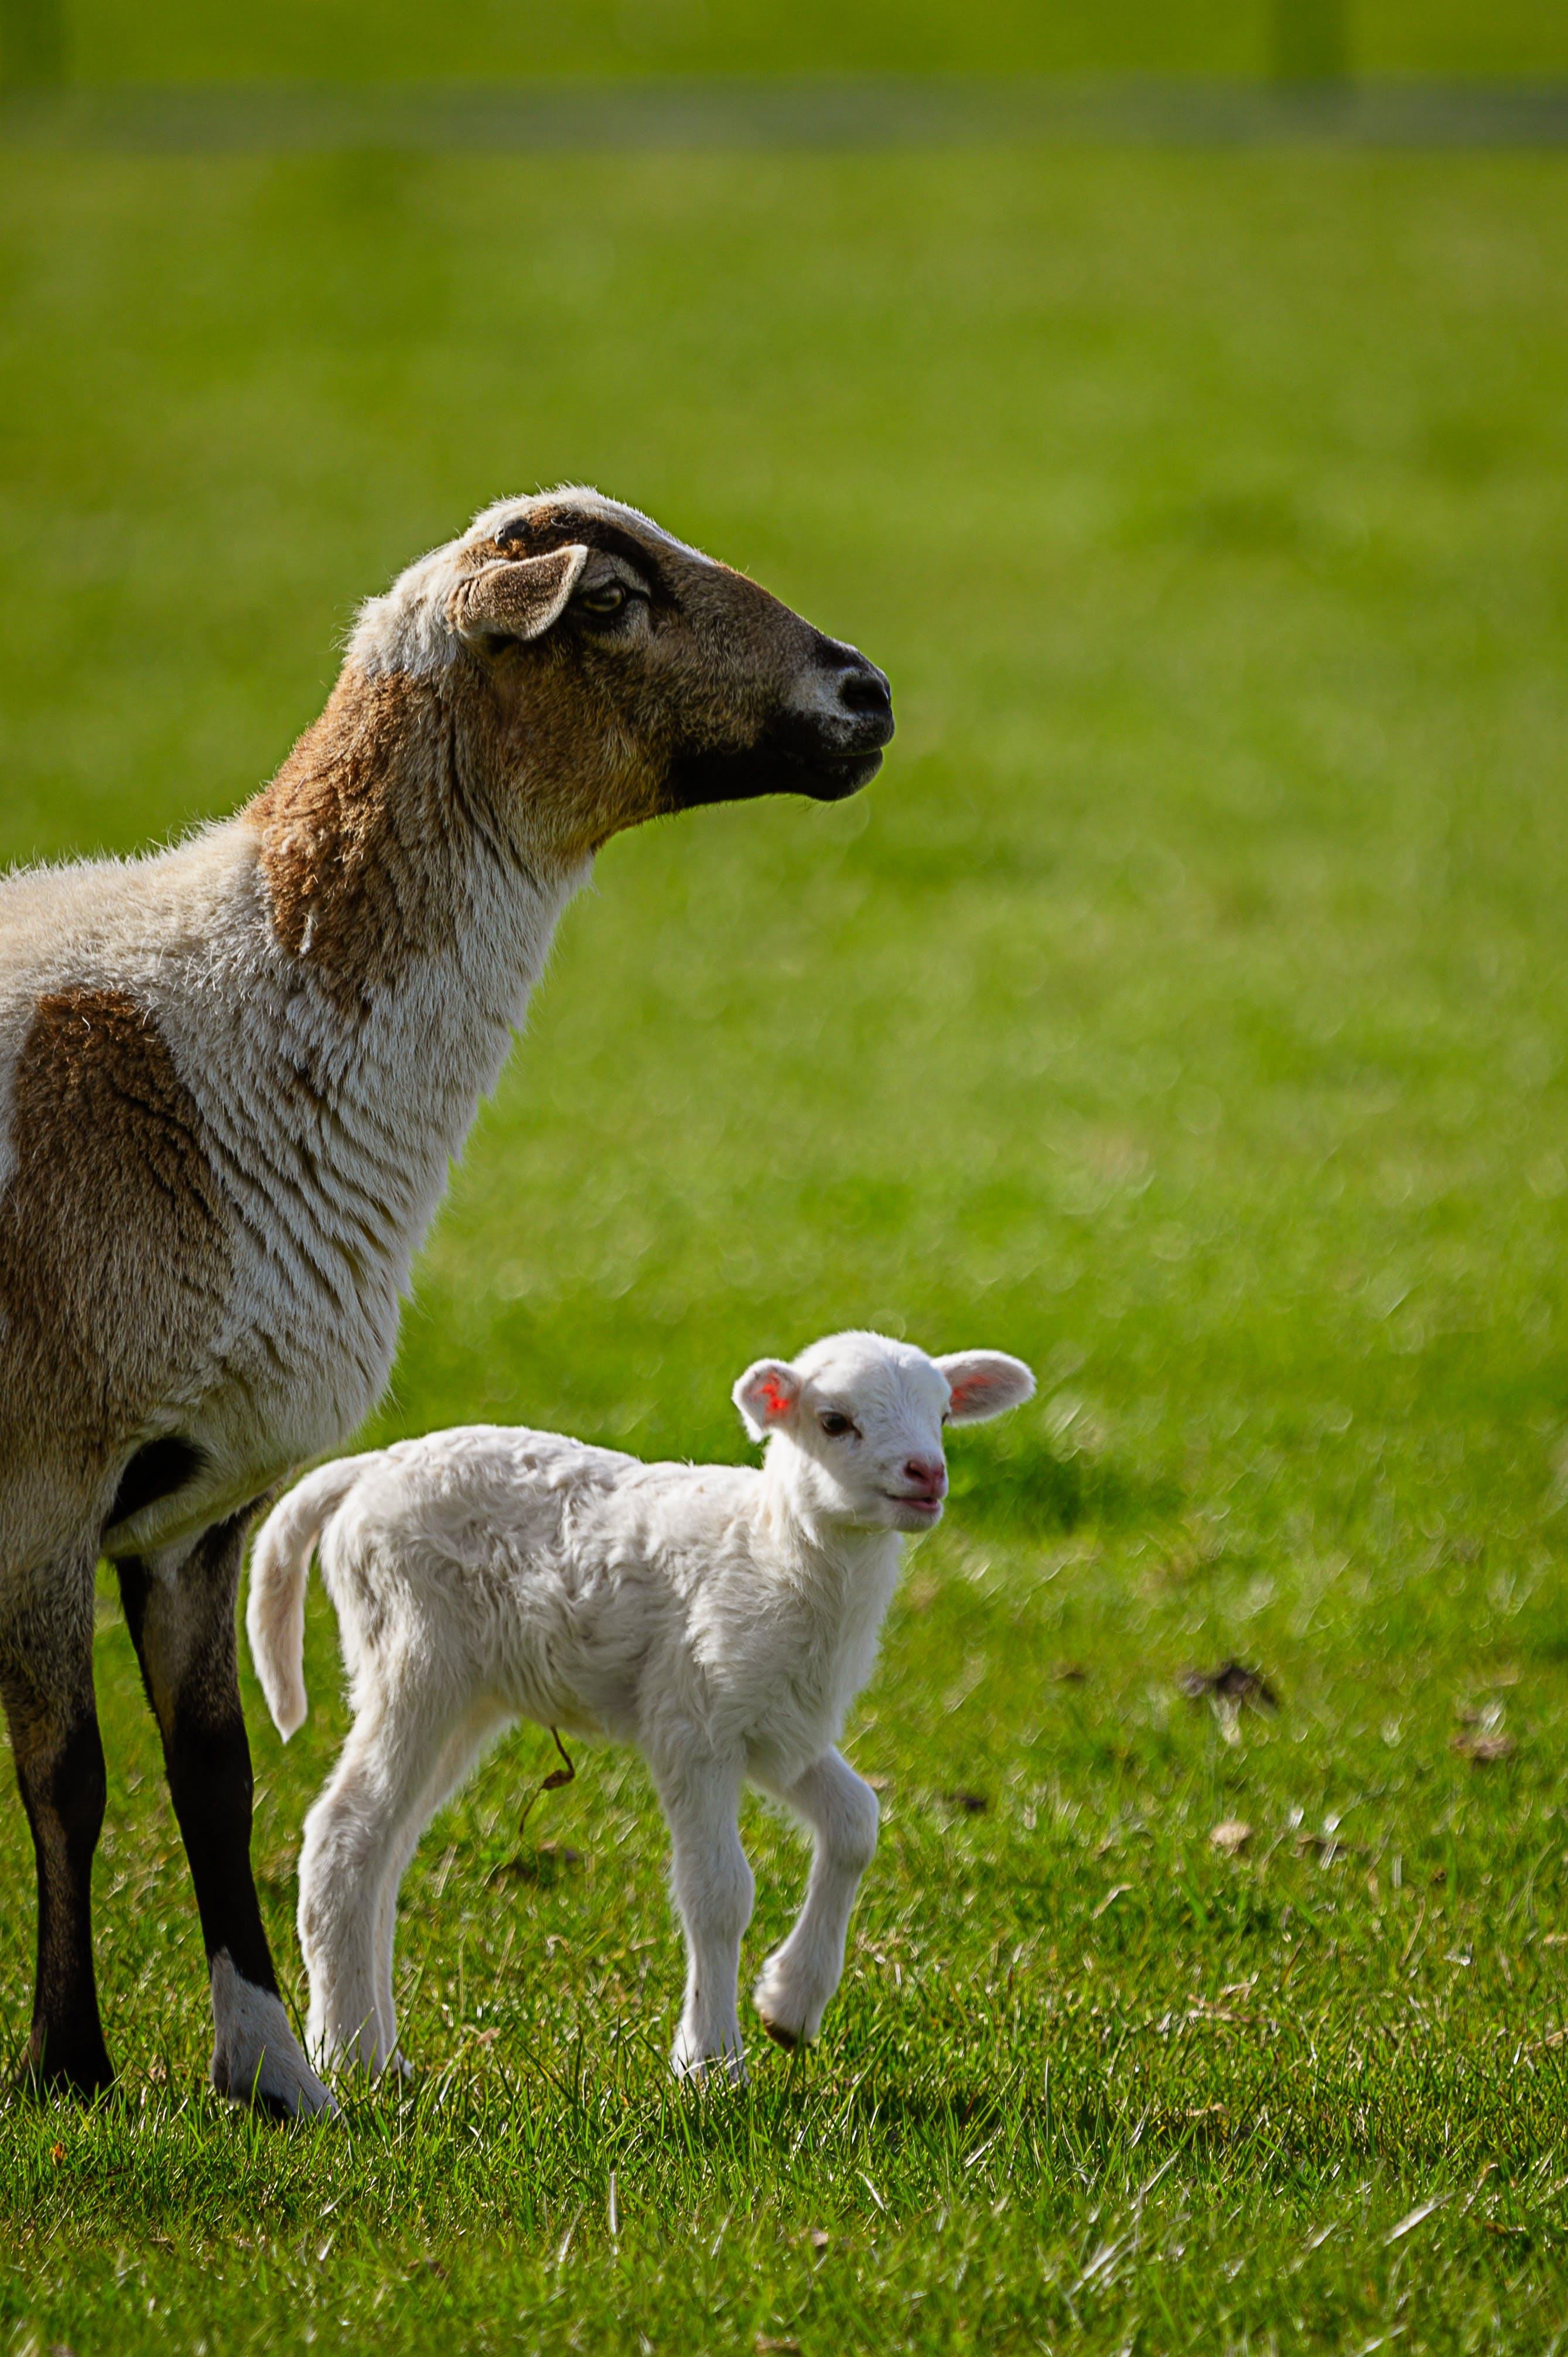 Fotos de stock gratuitas de agricultura, animal, campo, campo de heno